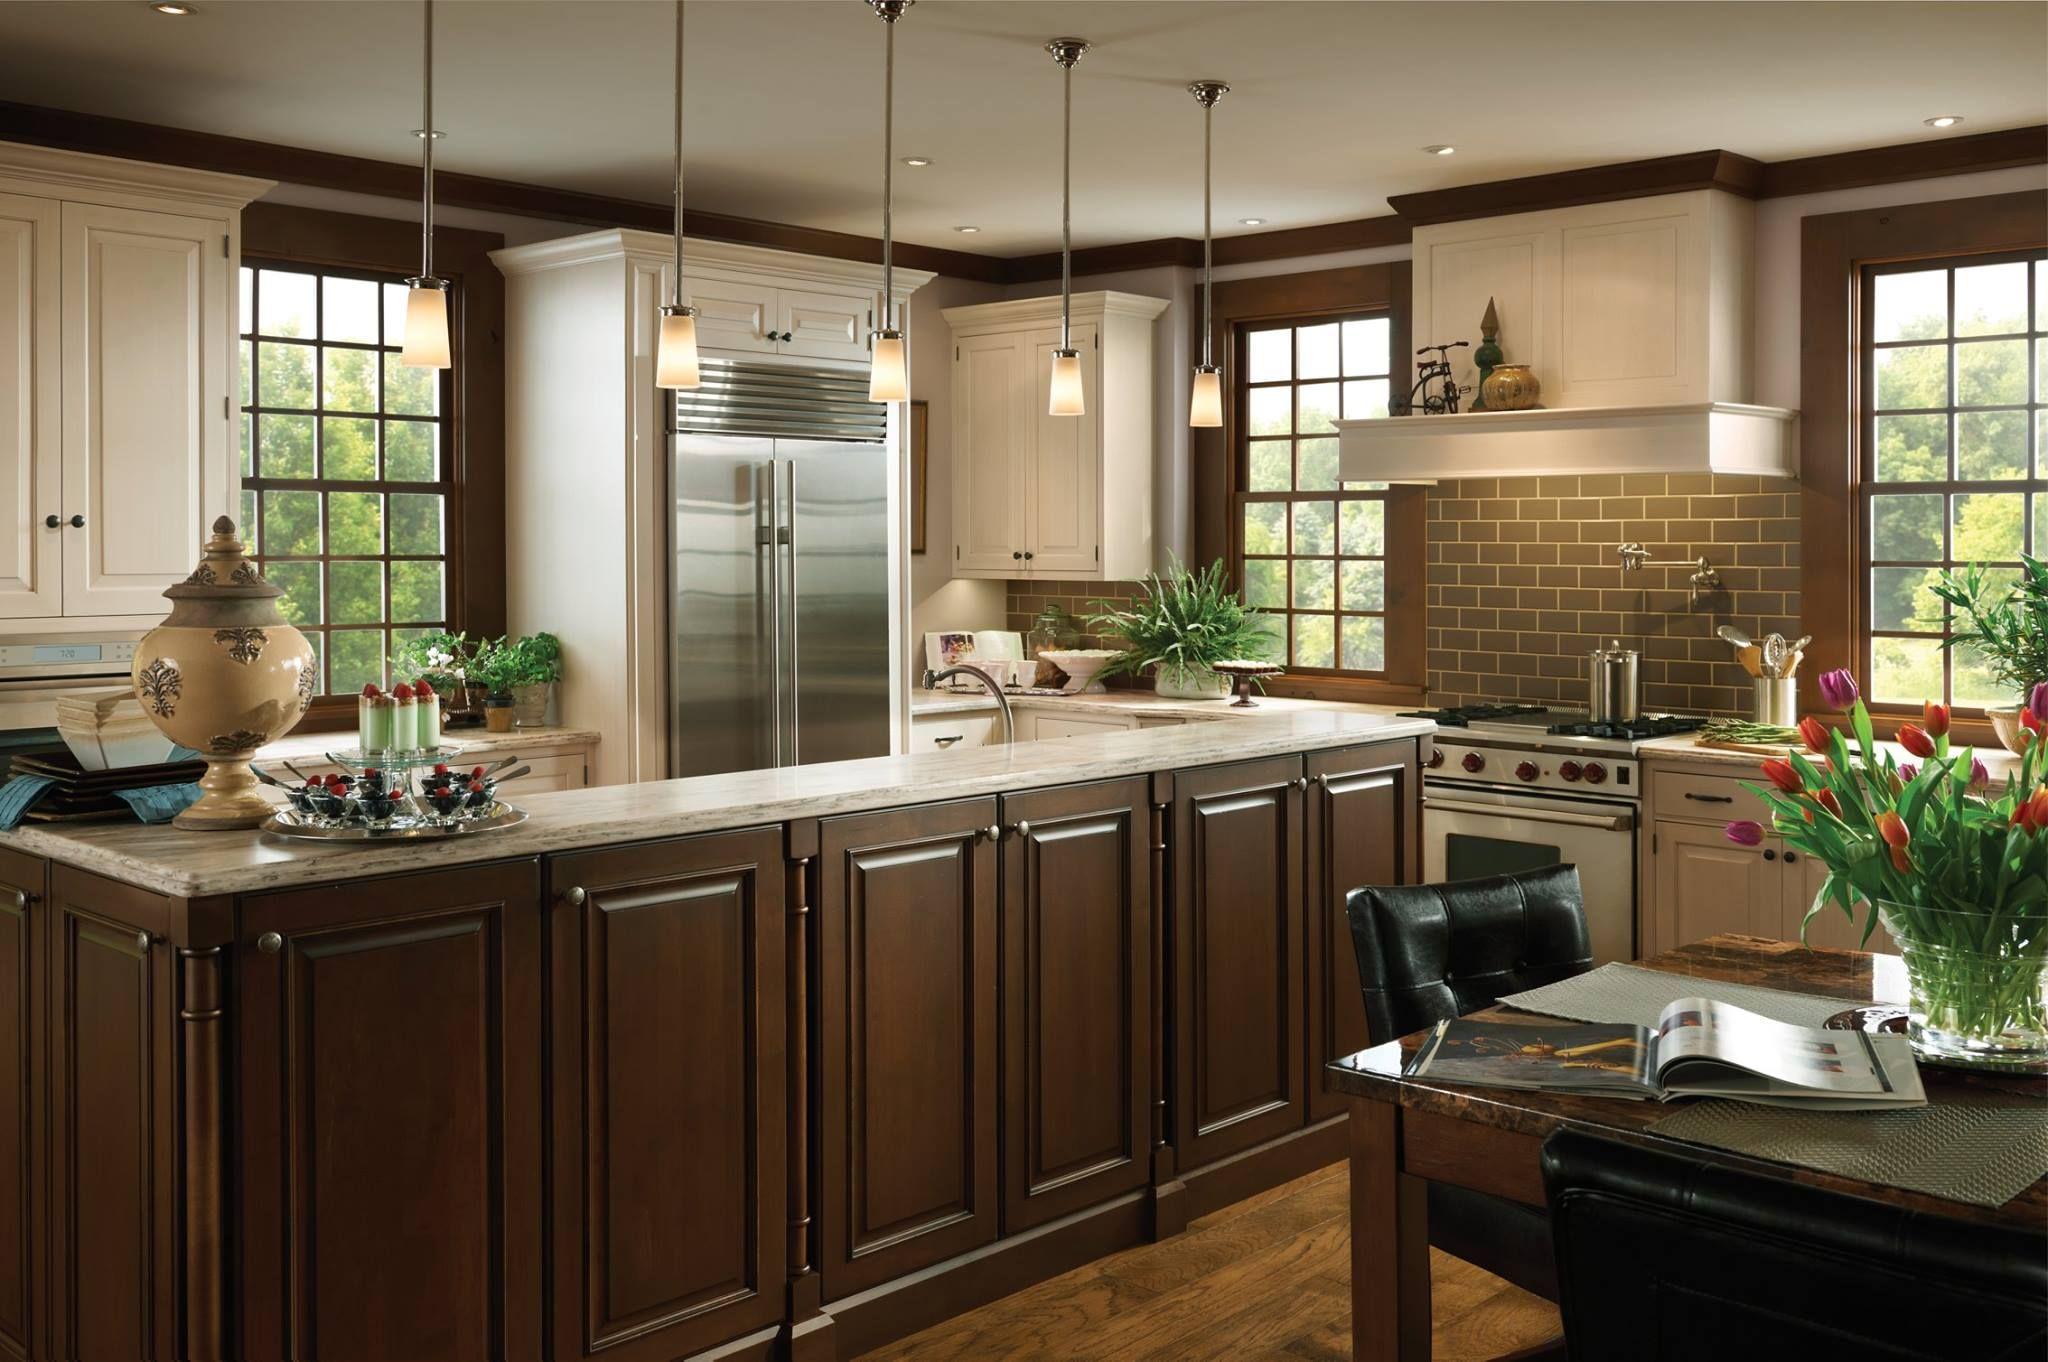 Wood Mode Cabinets Houston Texas Kitchen Design Contemporary Kitchen Custom Kitchen Cabinets